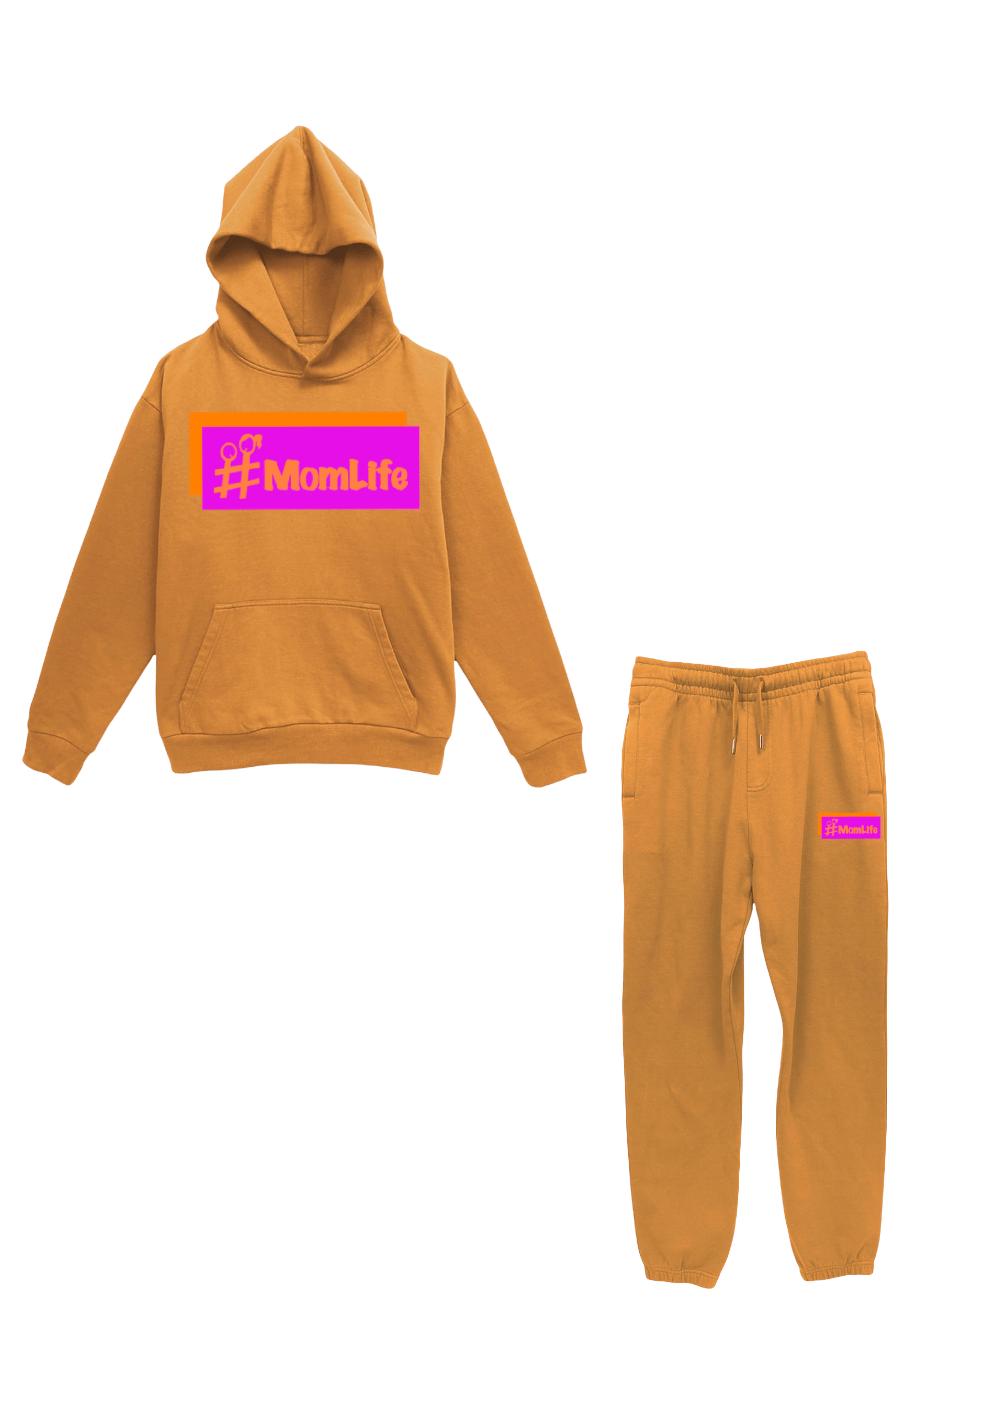 Image of #MomLife Fall2021 Sweatsuit